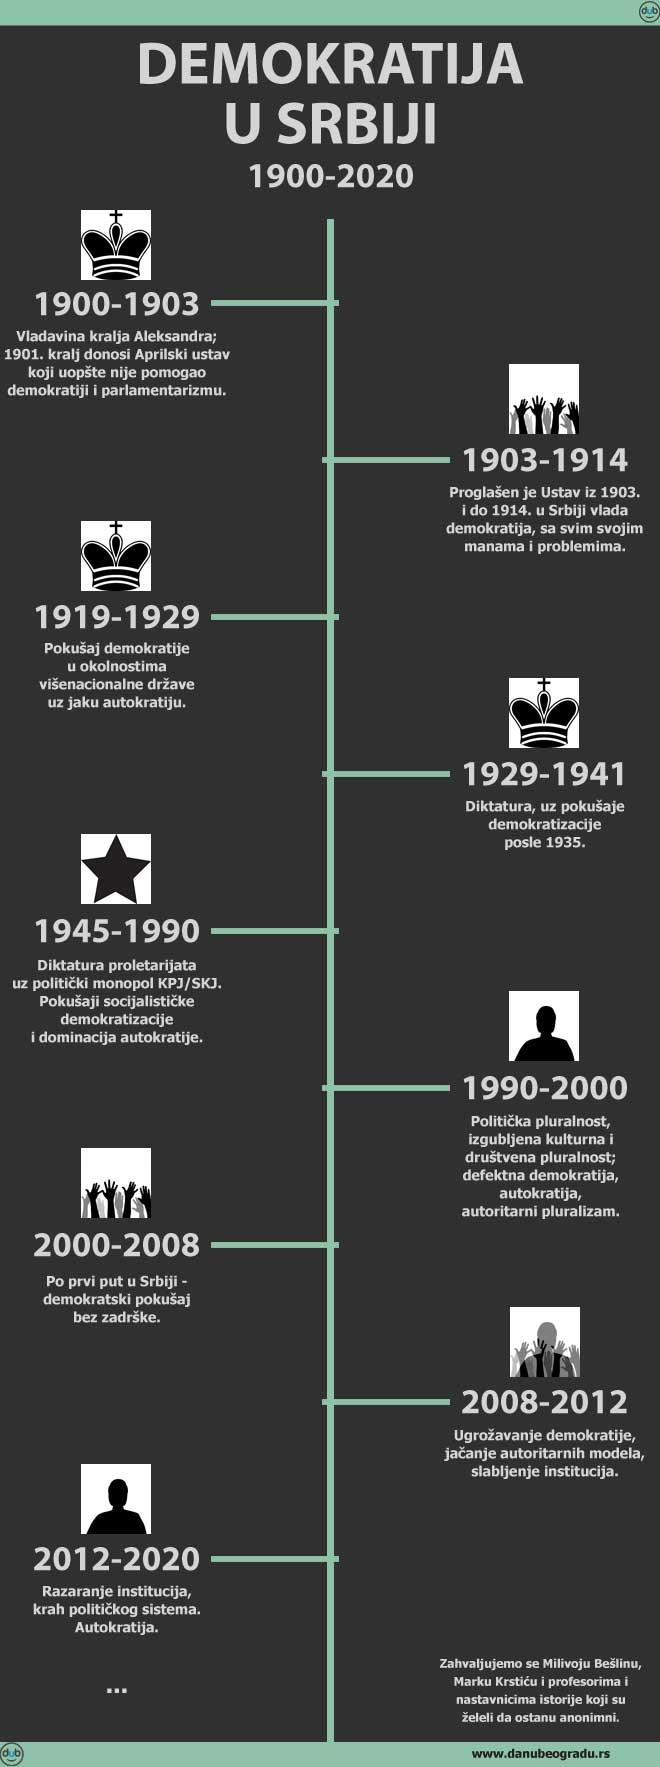 Demokratija u Srbiji, 1900-2020. - infografika (infografika: danubeogradu.rs / NM)